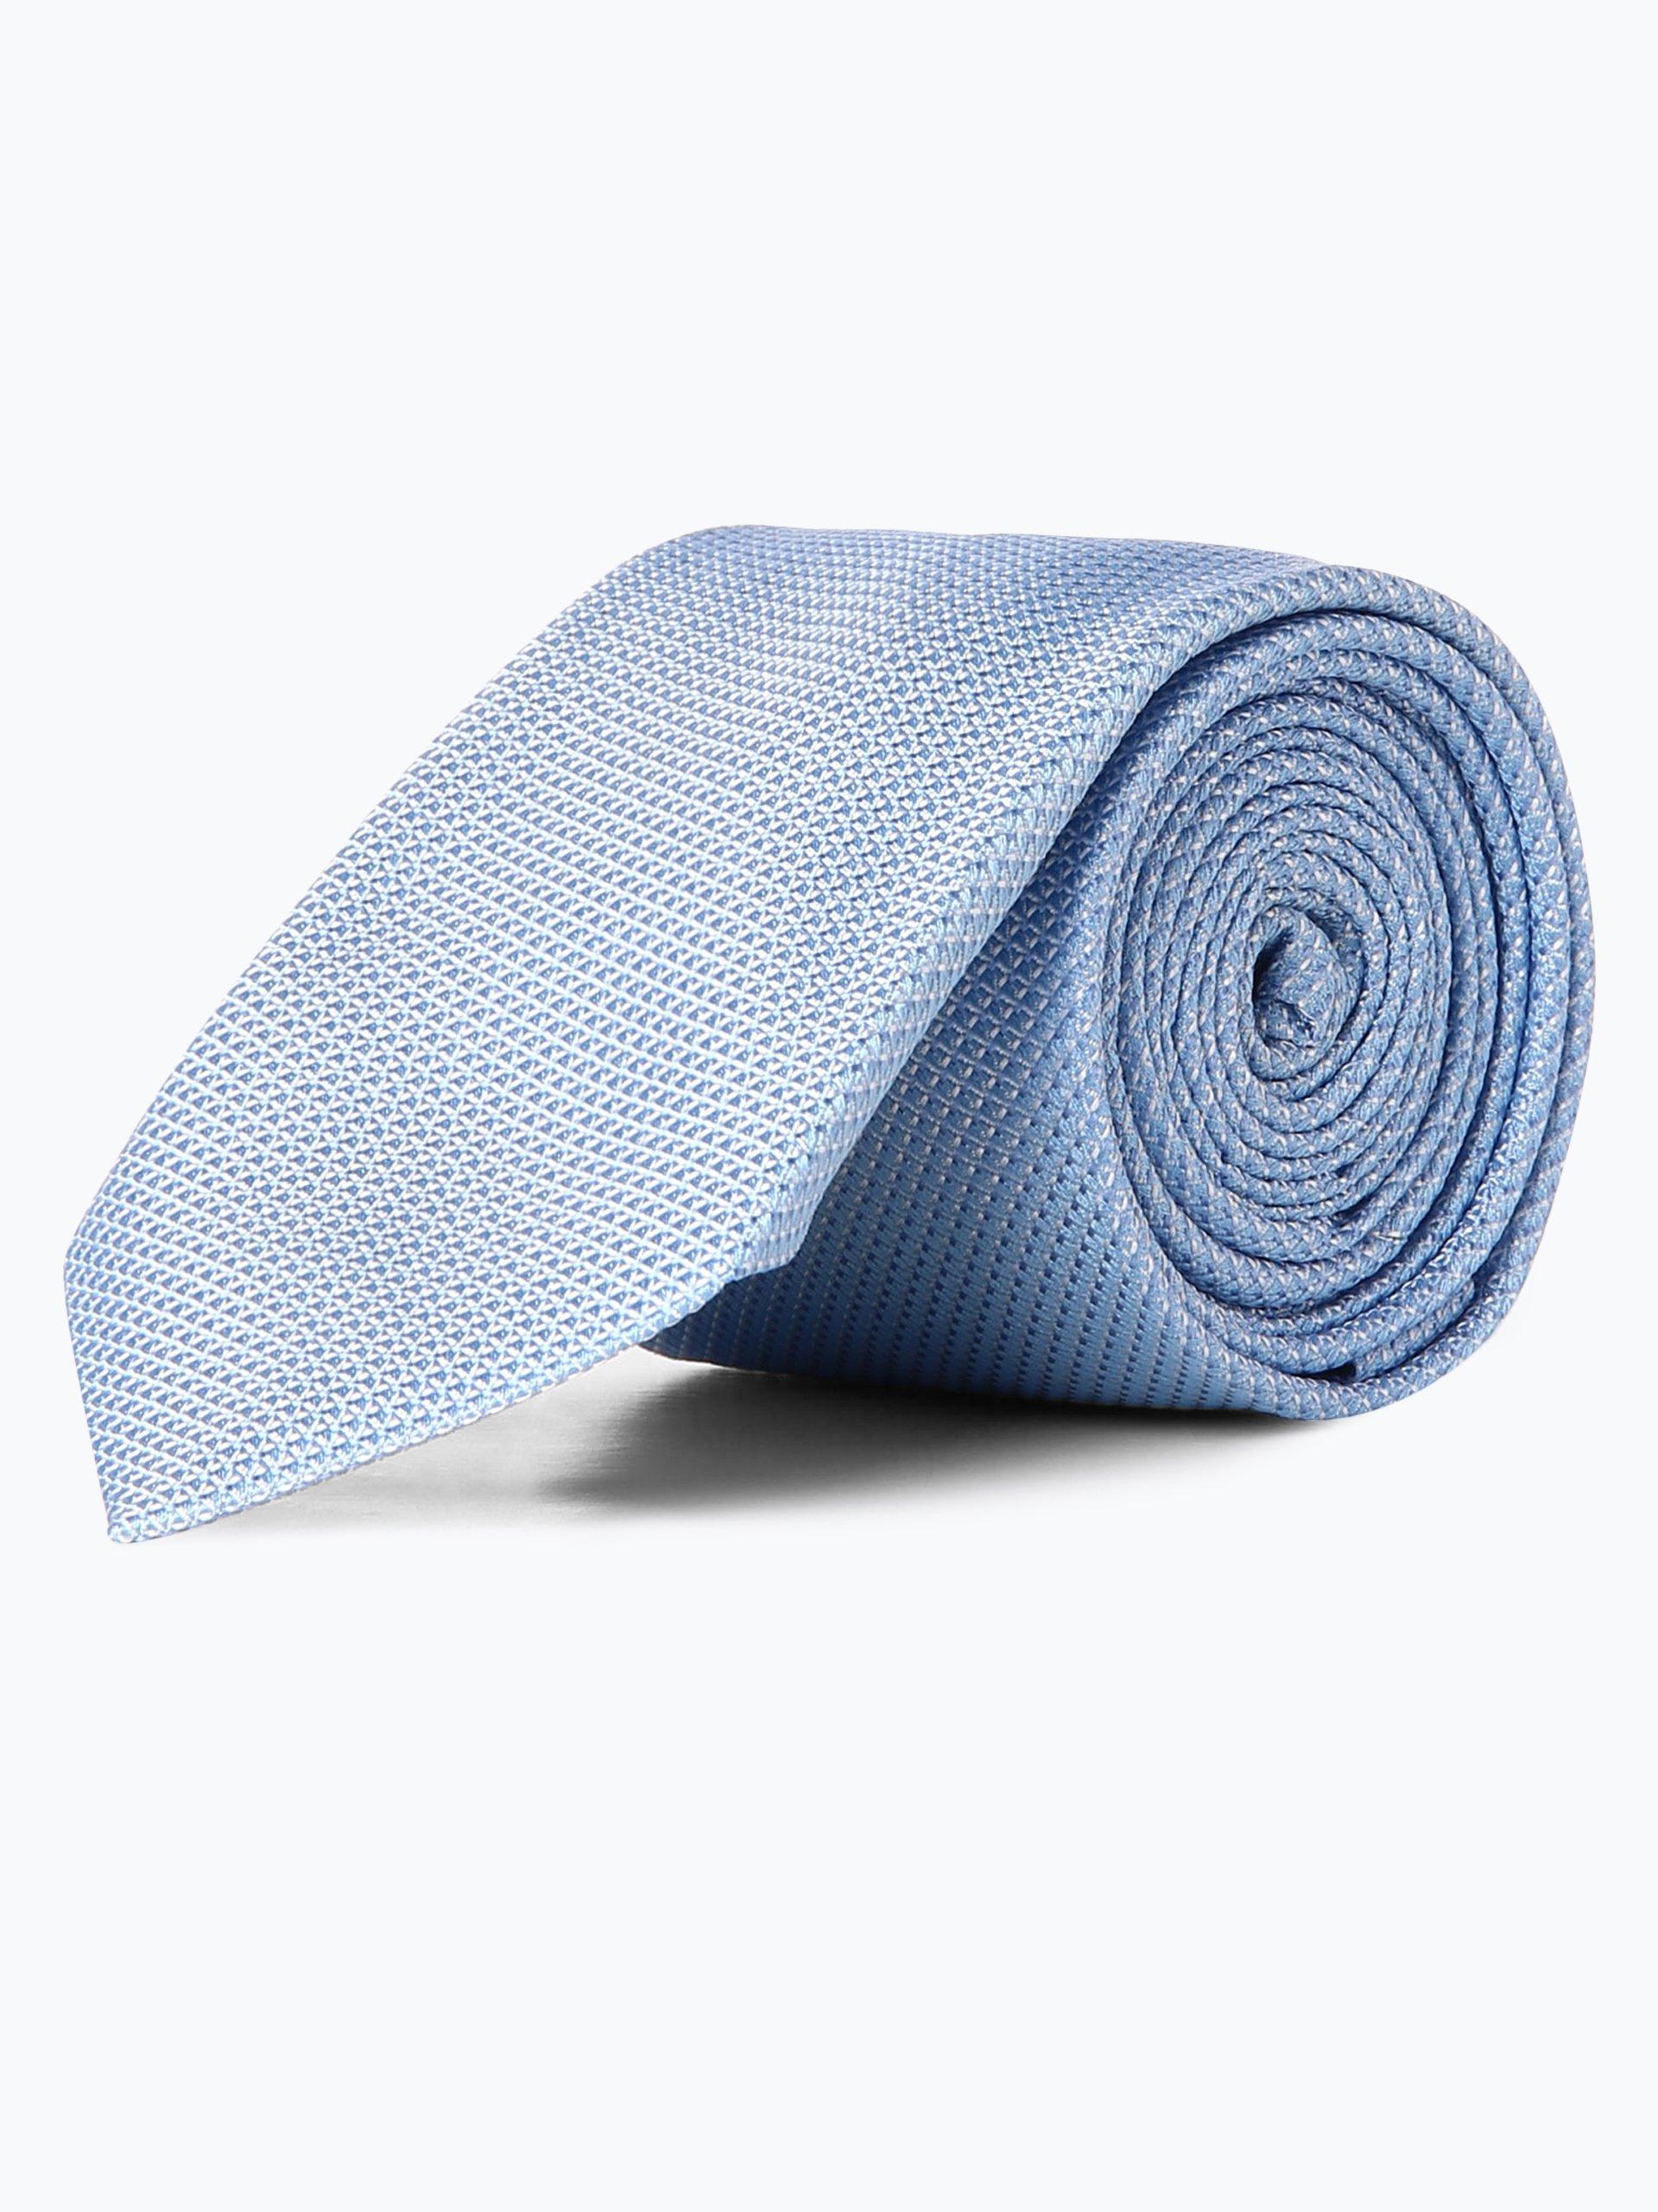 hugo herren krawatte aus seide hellblau gemustert online kaufen vangraaf com. Black Bedroom Furniture Sets. Home Design Ideas